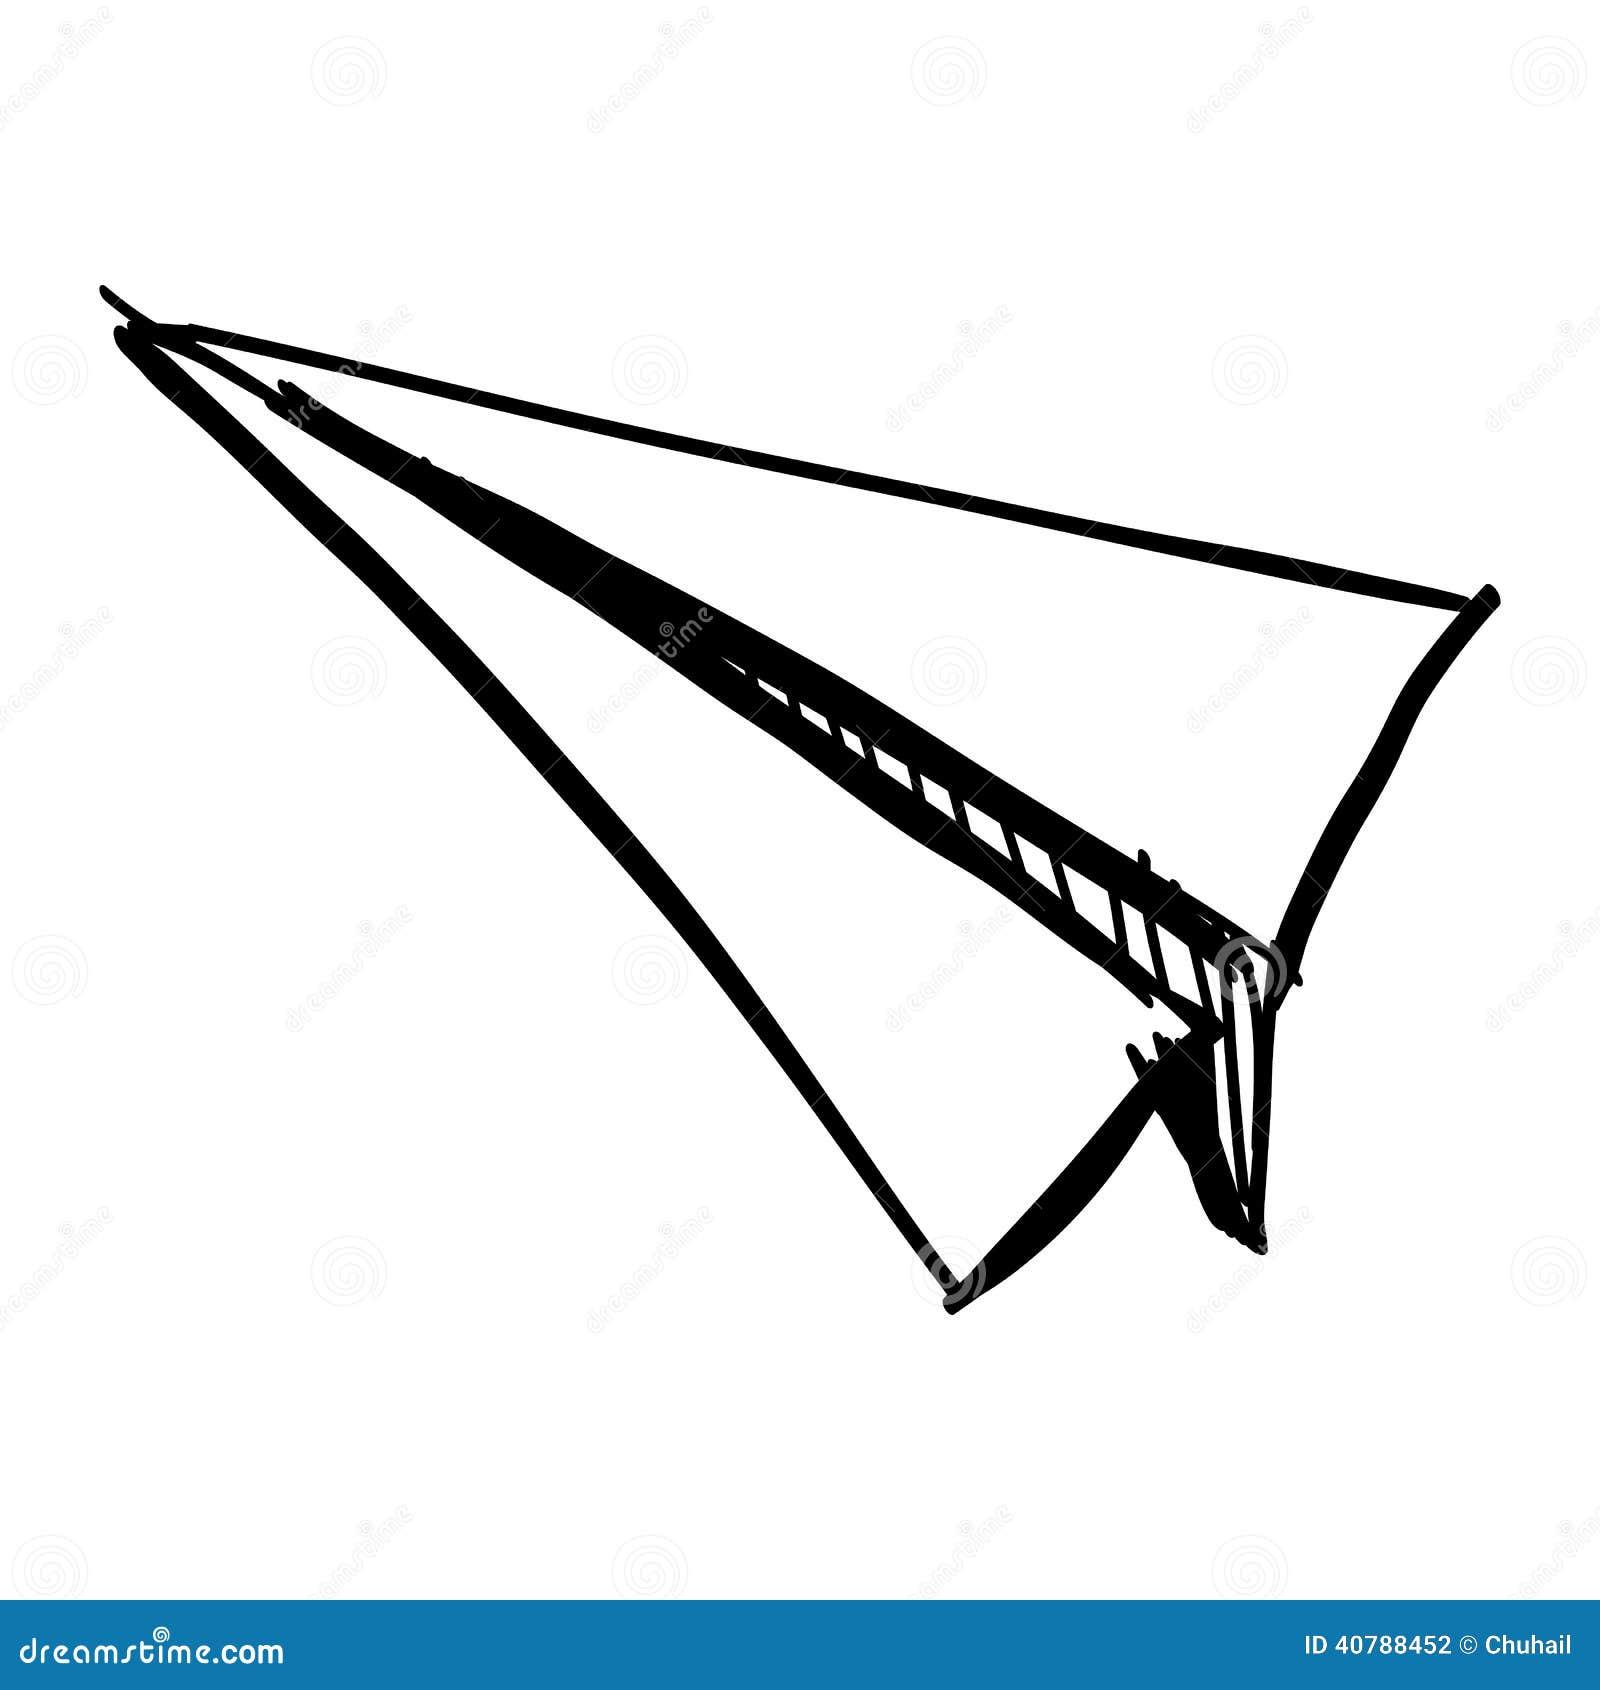 paper plane stock illustration - photo #32